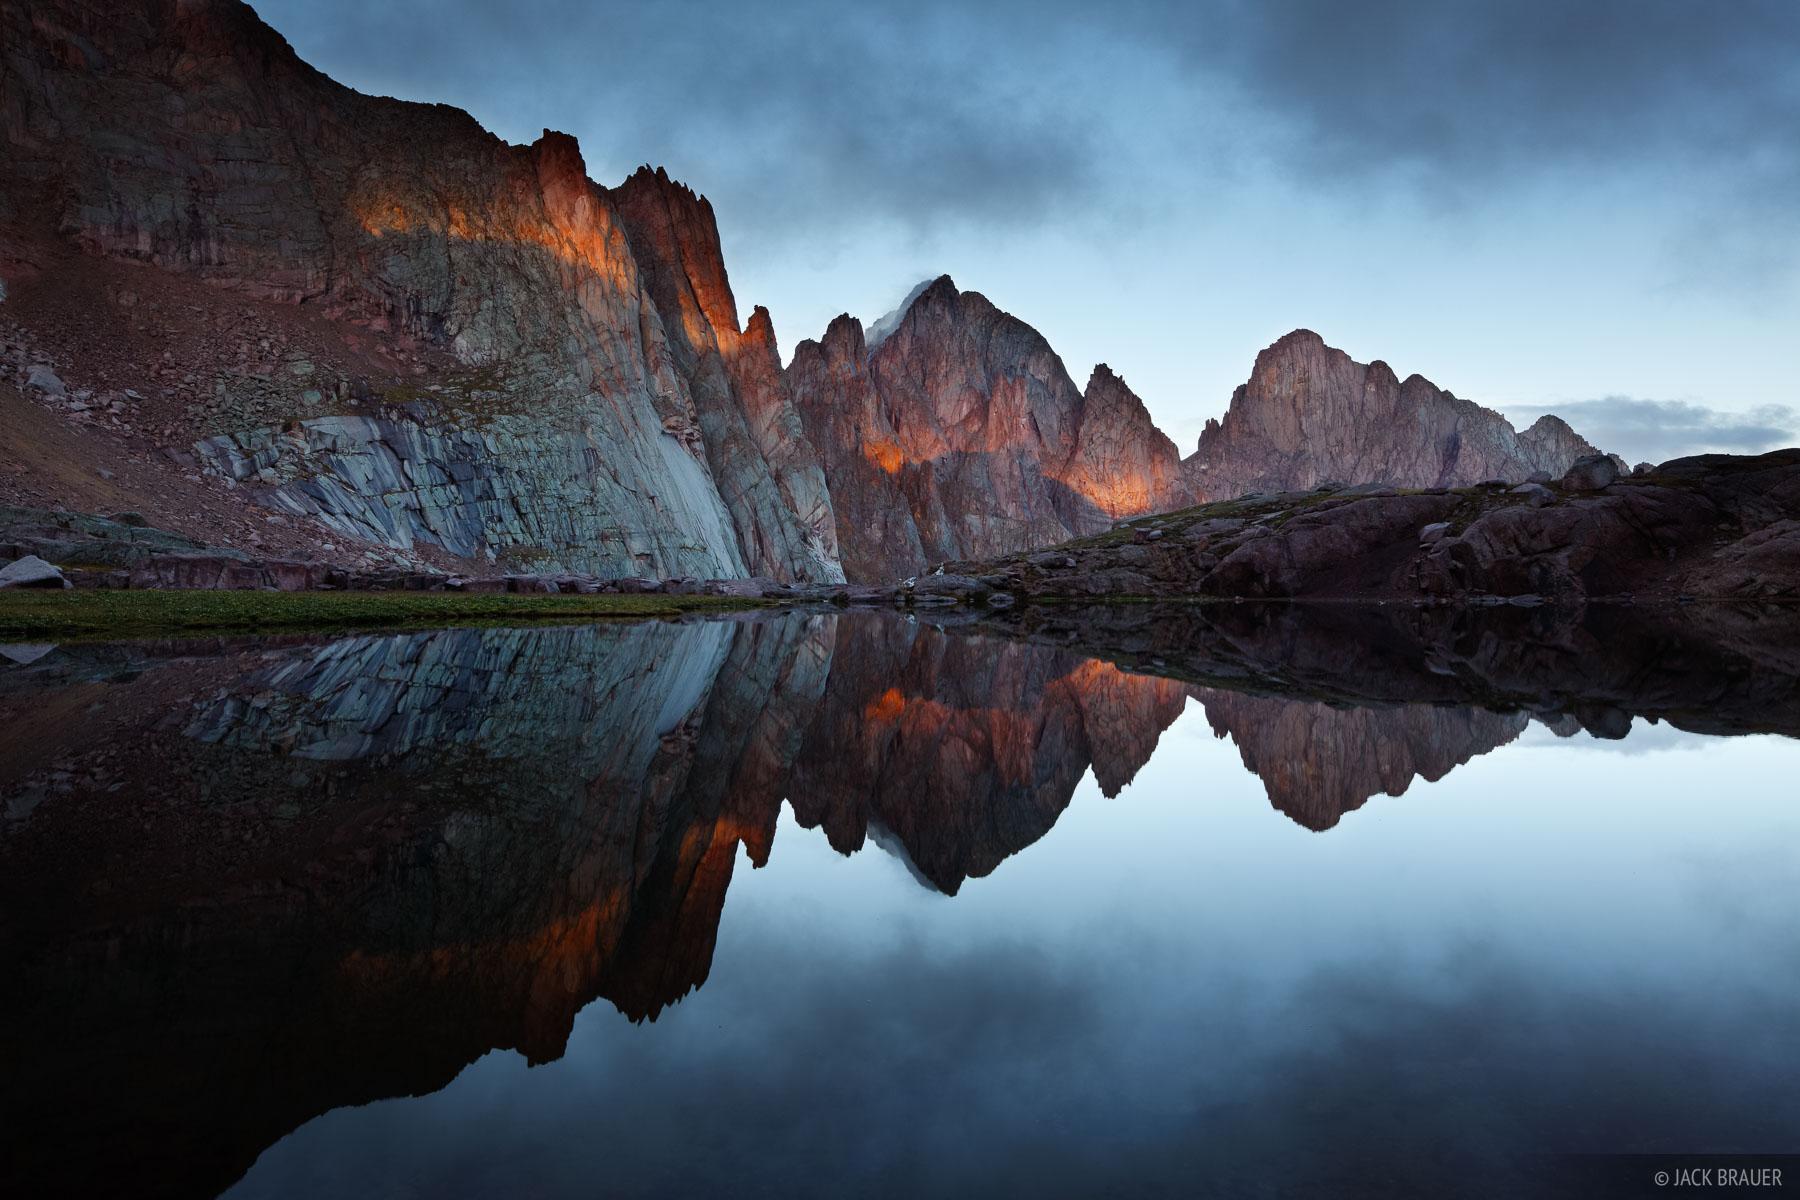 Needle Mountains, Weminuche Wilderness, San Juan Mountains, Colorado, sunrise, photo